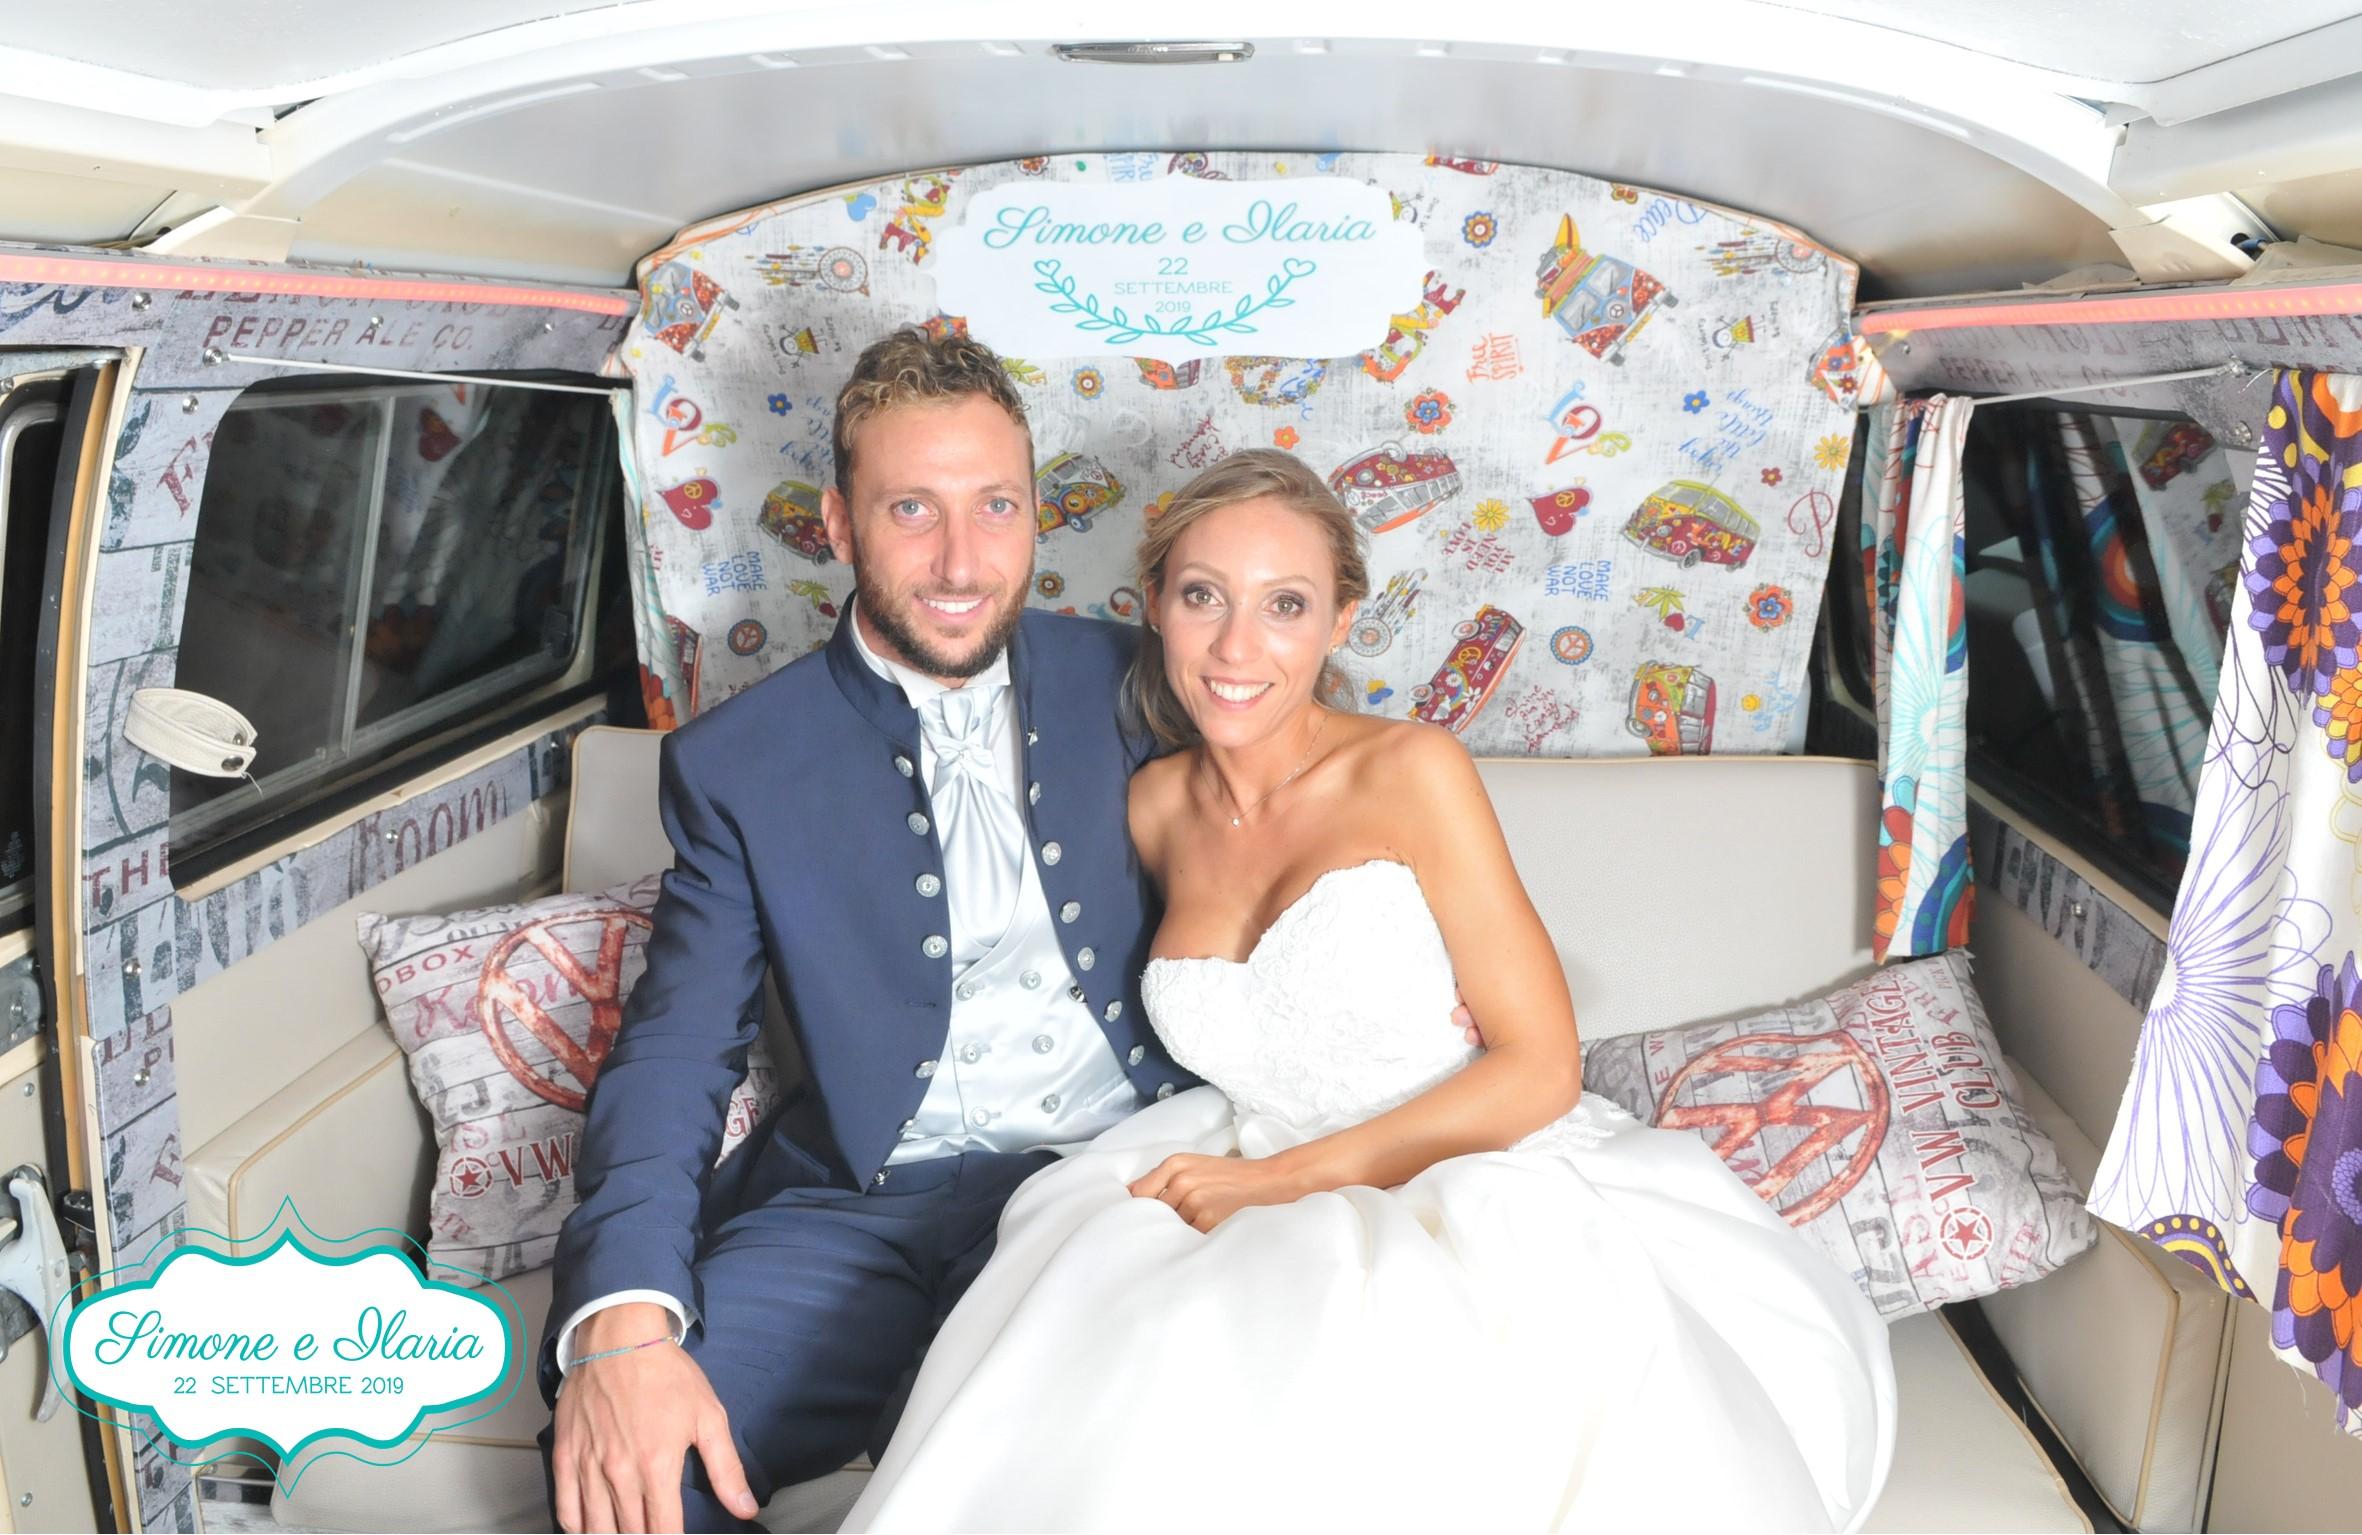 patrizi-fotografi-matrimoni-photobooth-simone-e-ilaria-83